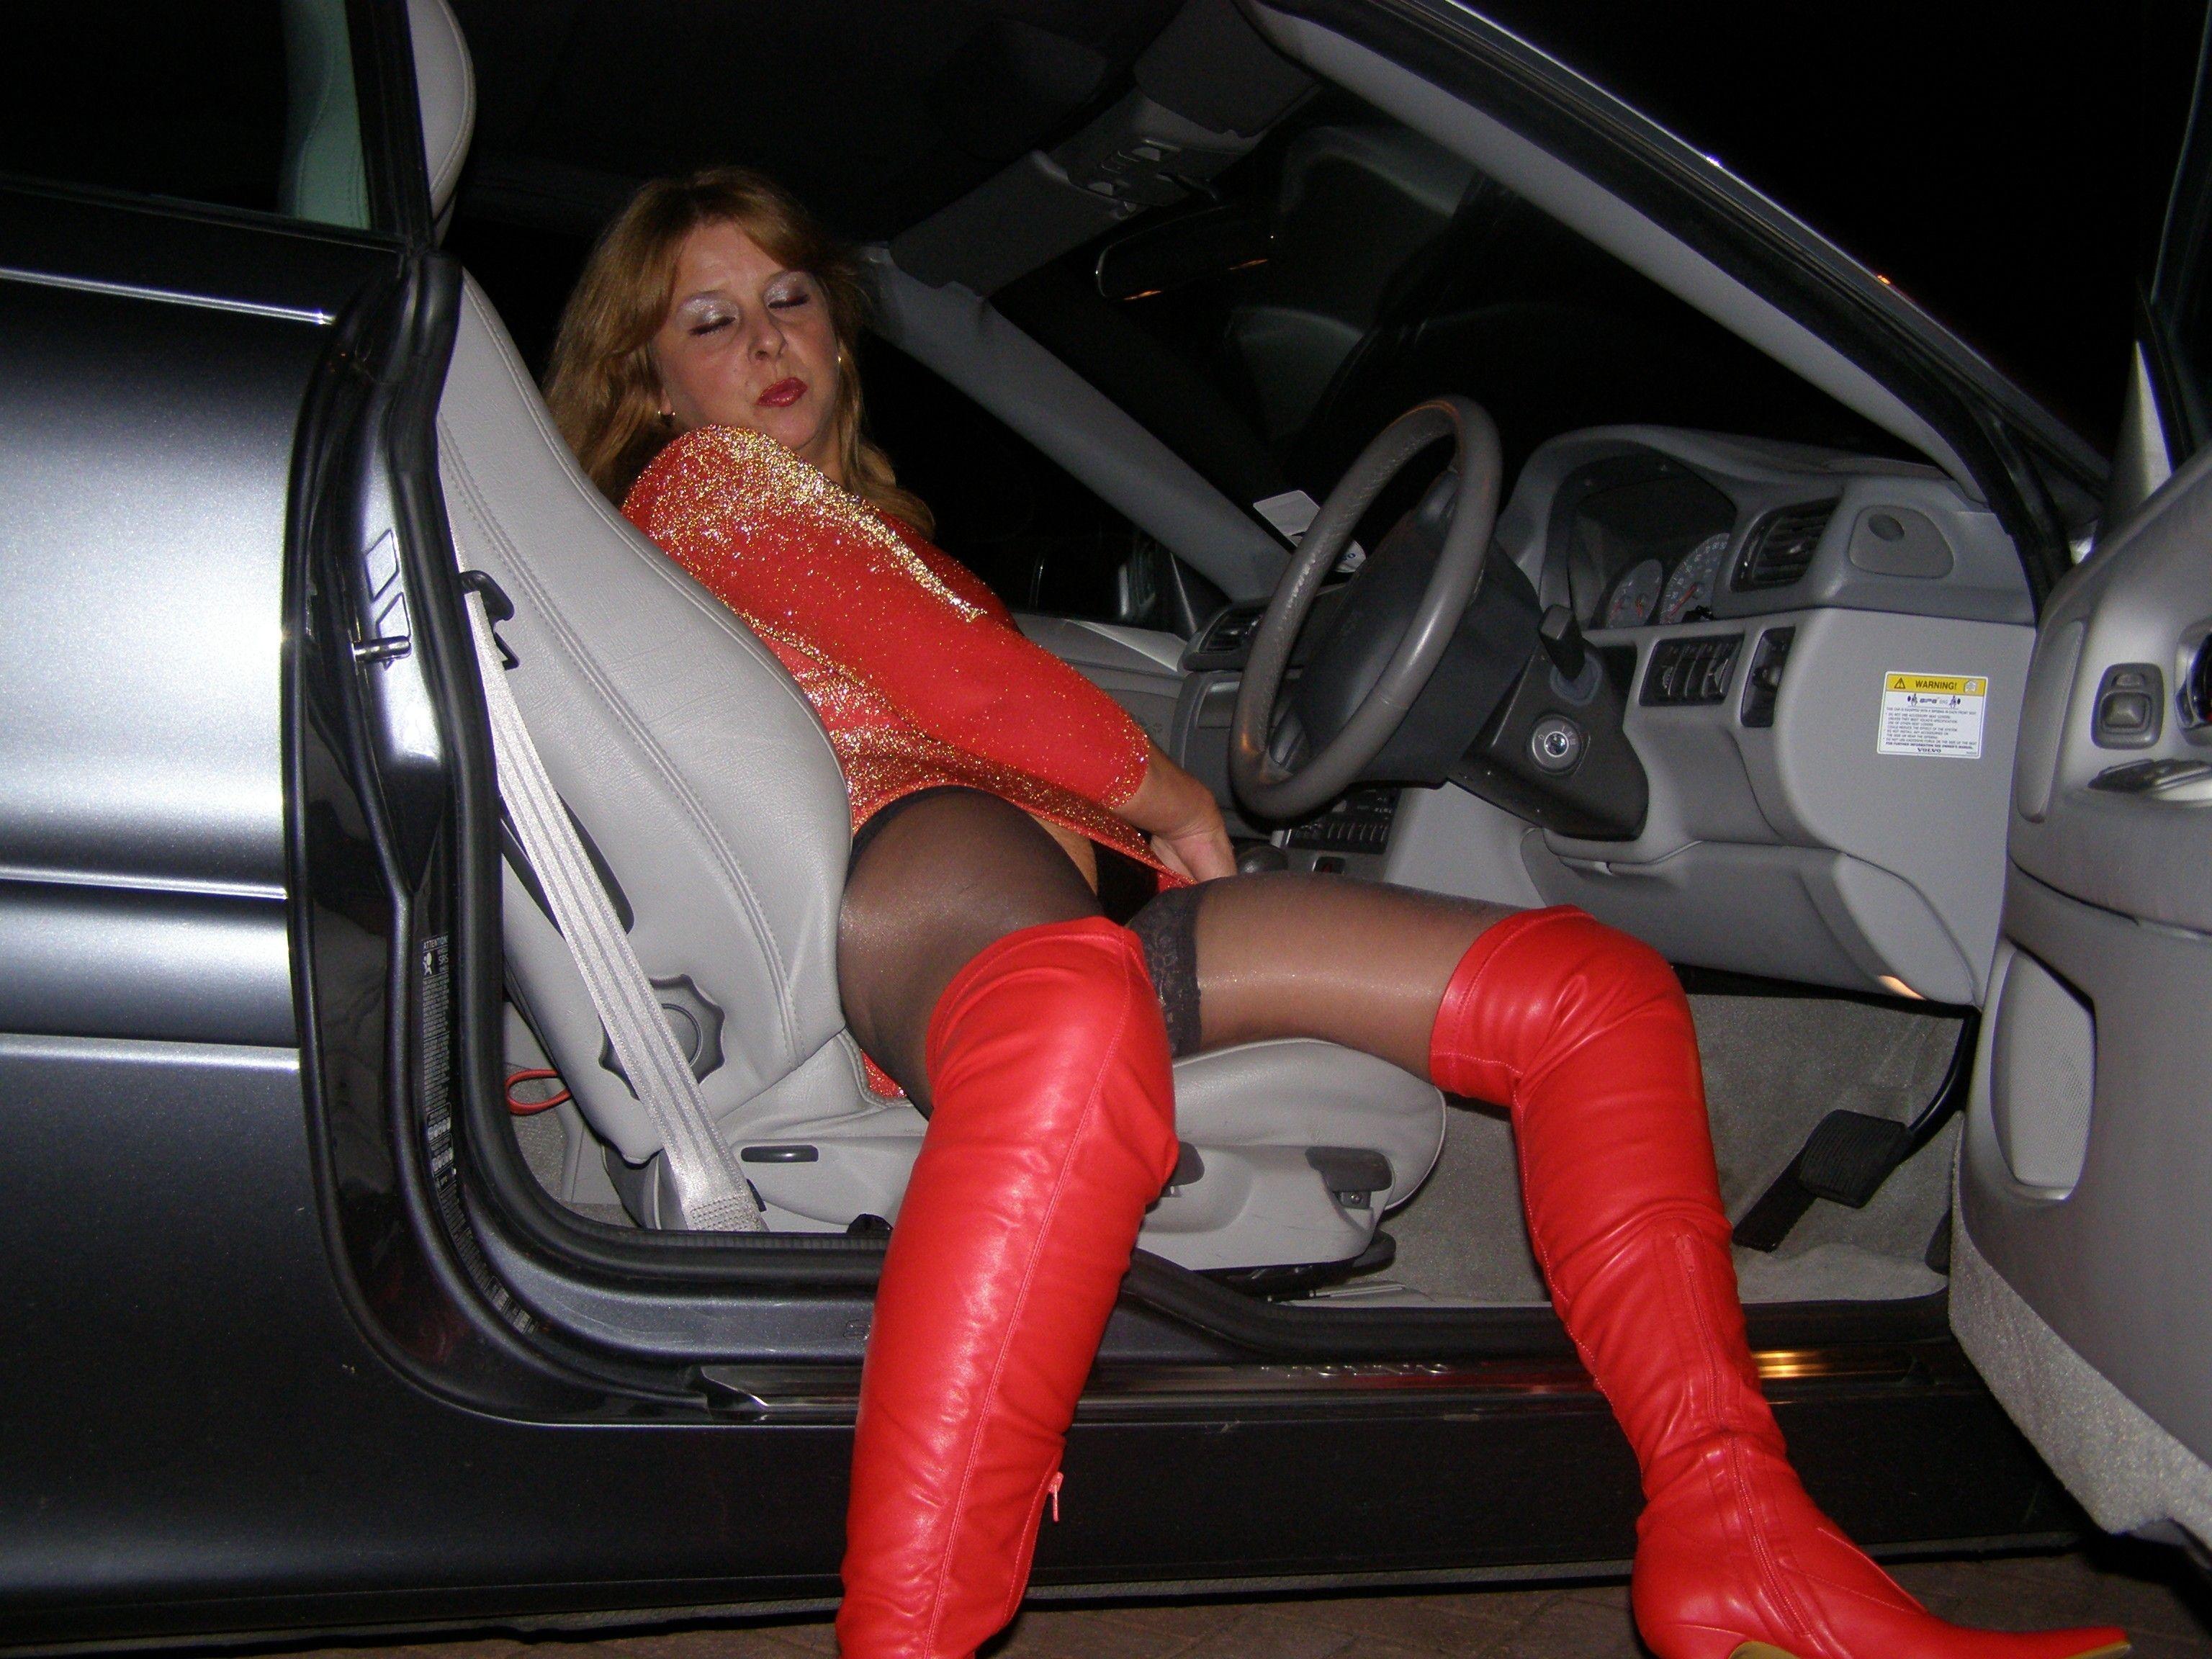 http://pbs-2.adult-empire.com/85/8570/005/pic/10.jpg